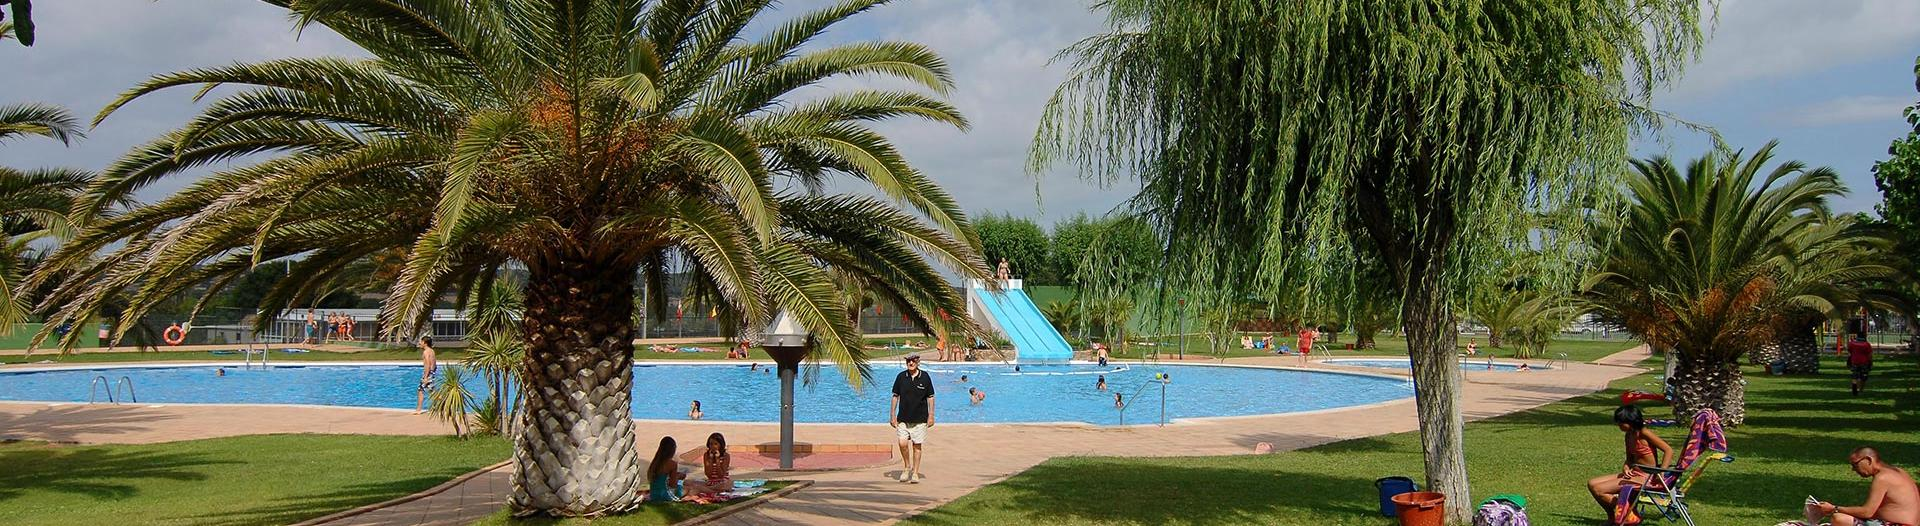 slider-camping-mas-patoxas-piscine